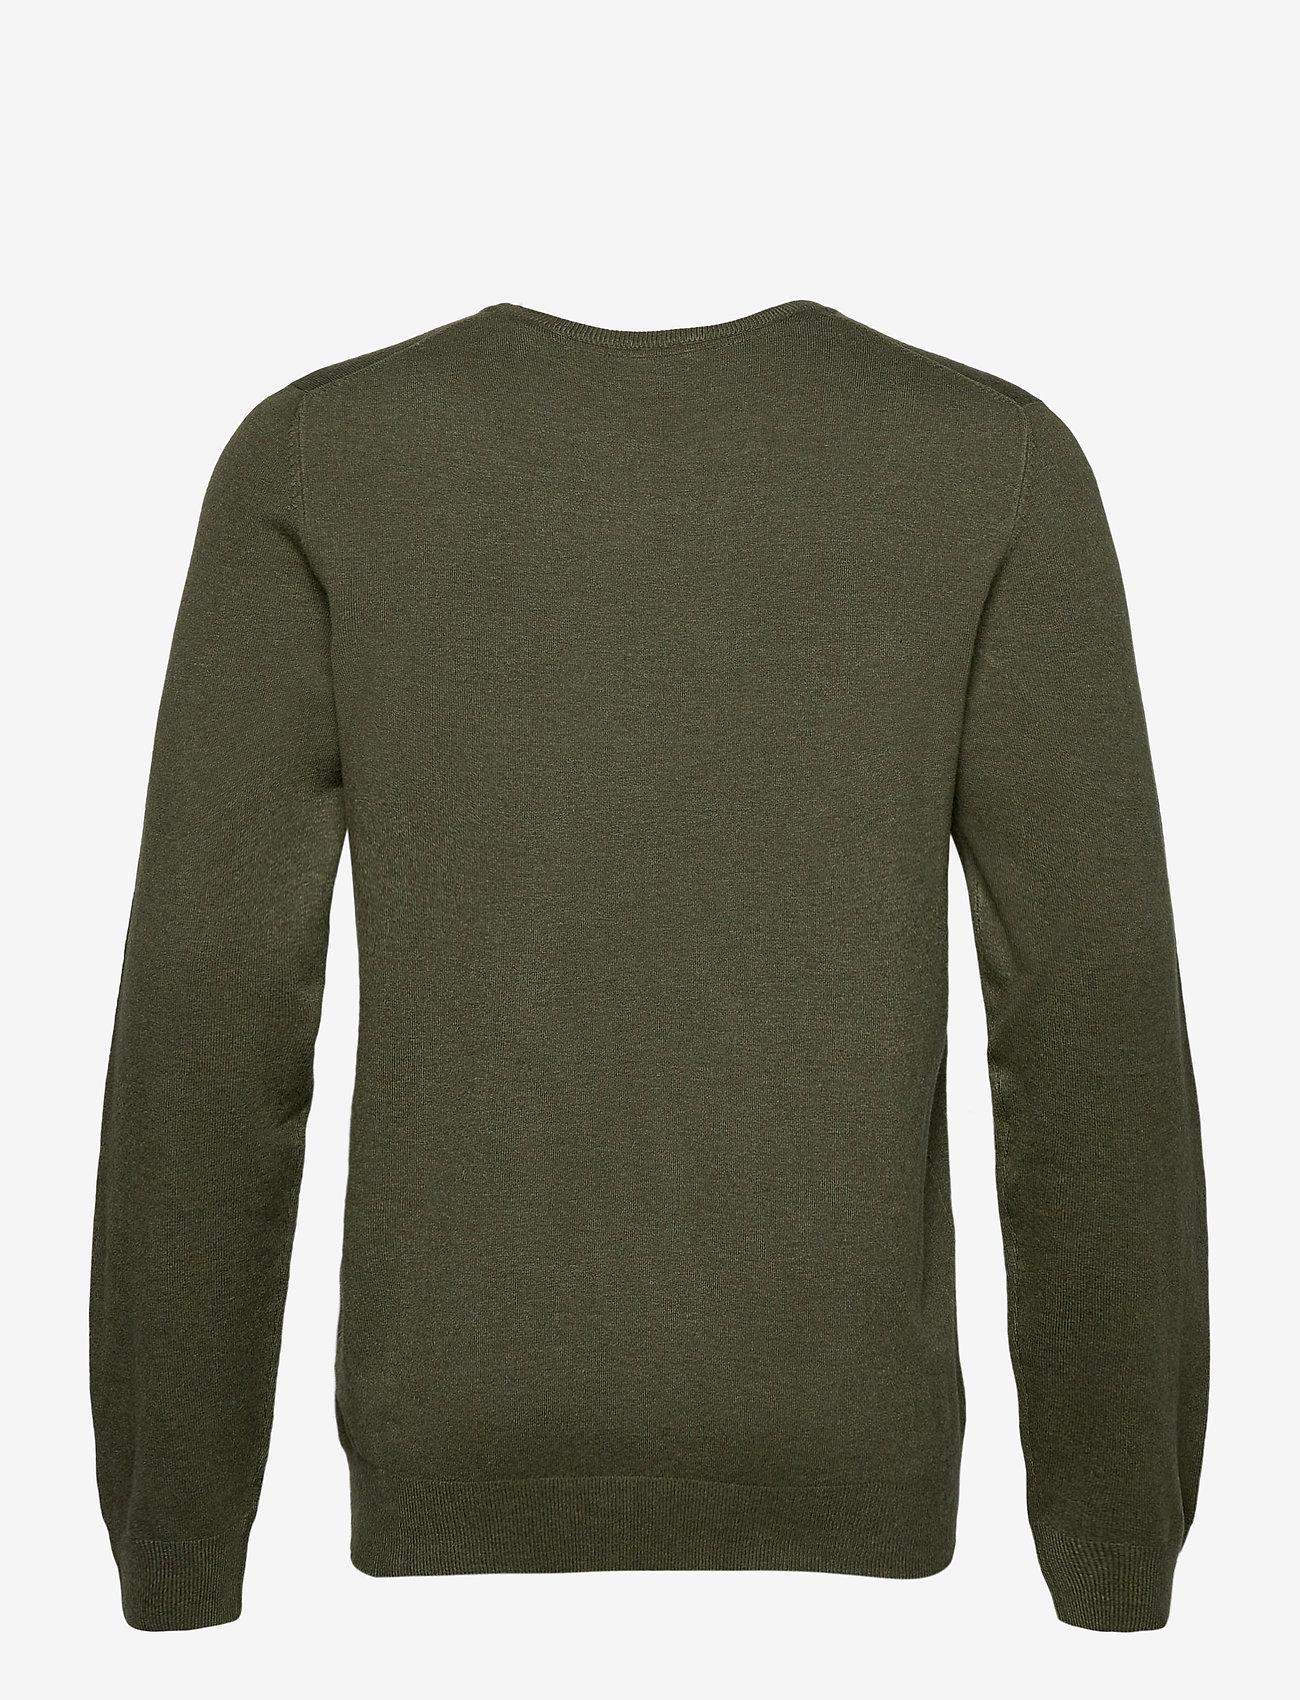 Lindbergh Mélange round neck knit - Strikkevarer ARMY MEL - Menn Klær